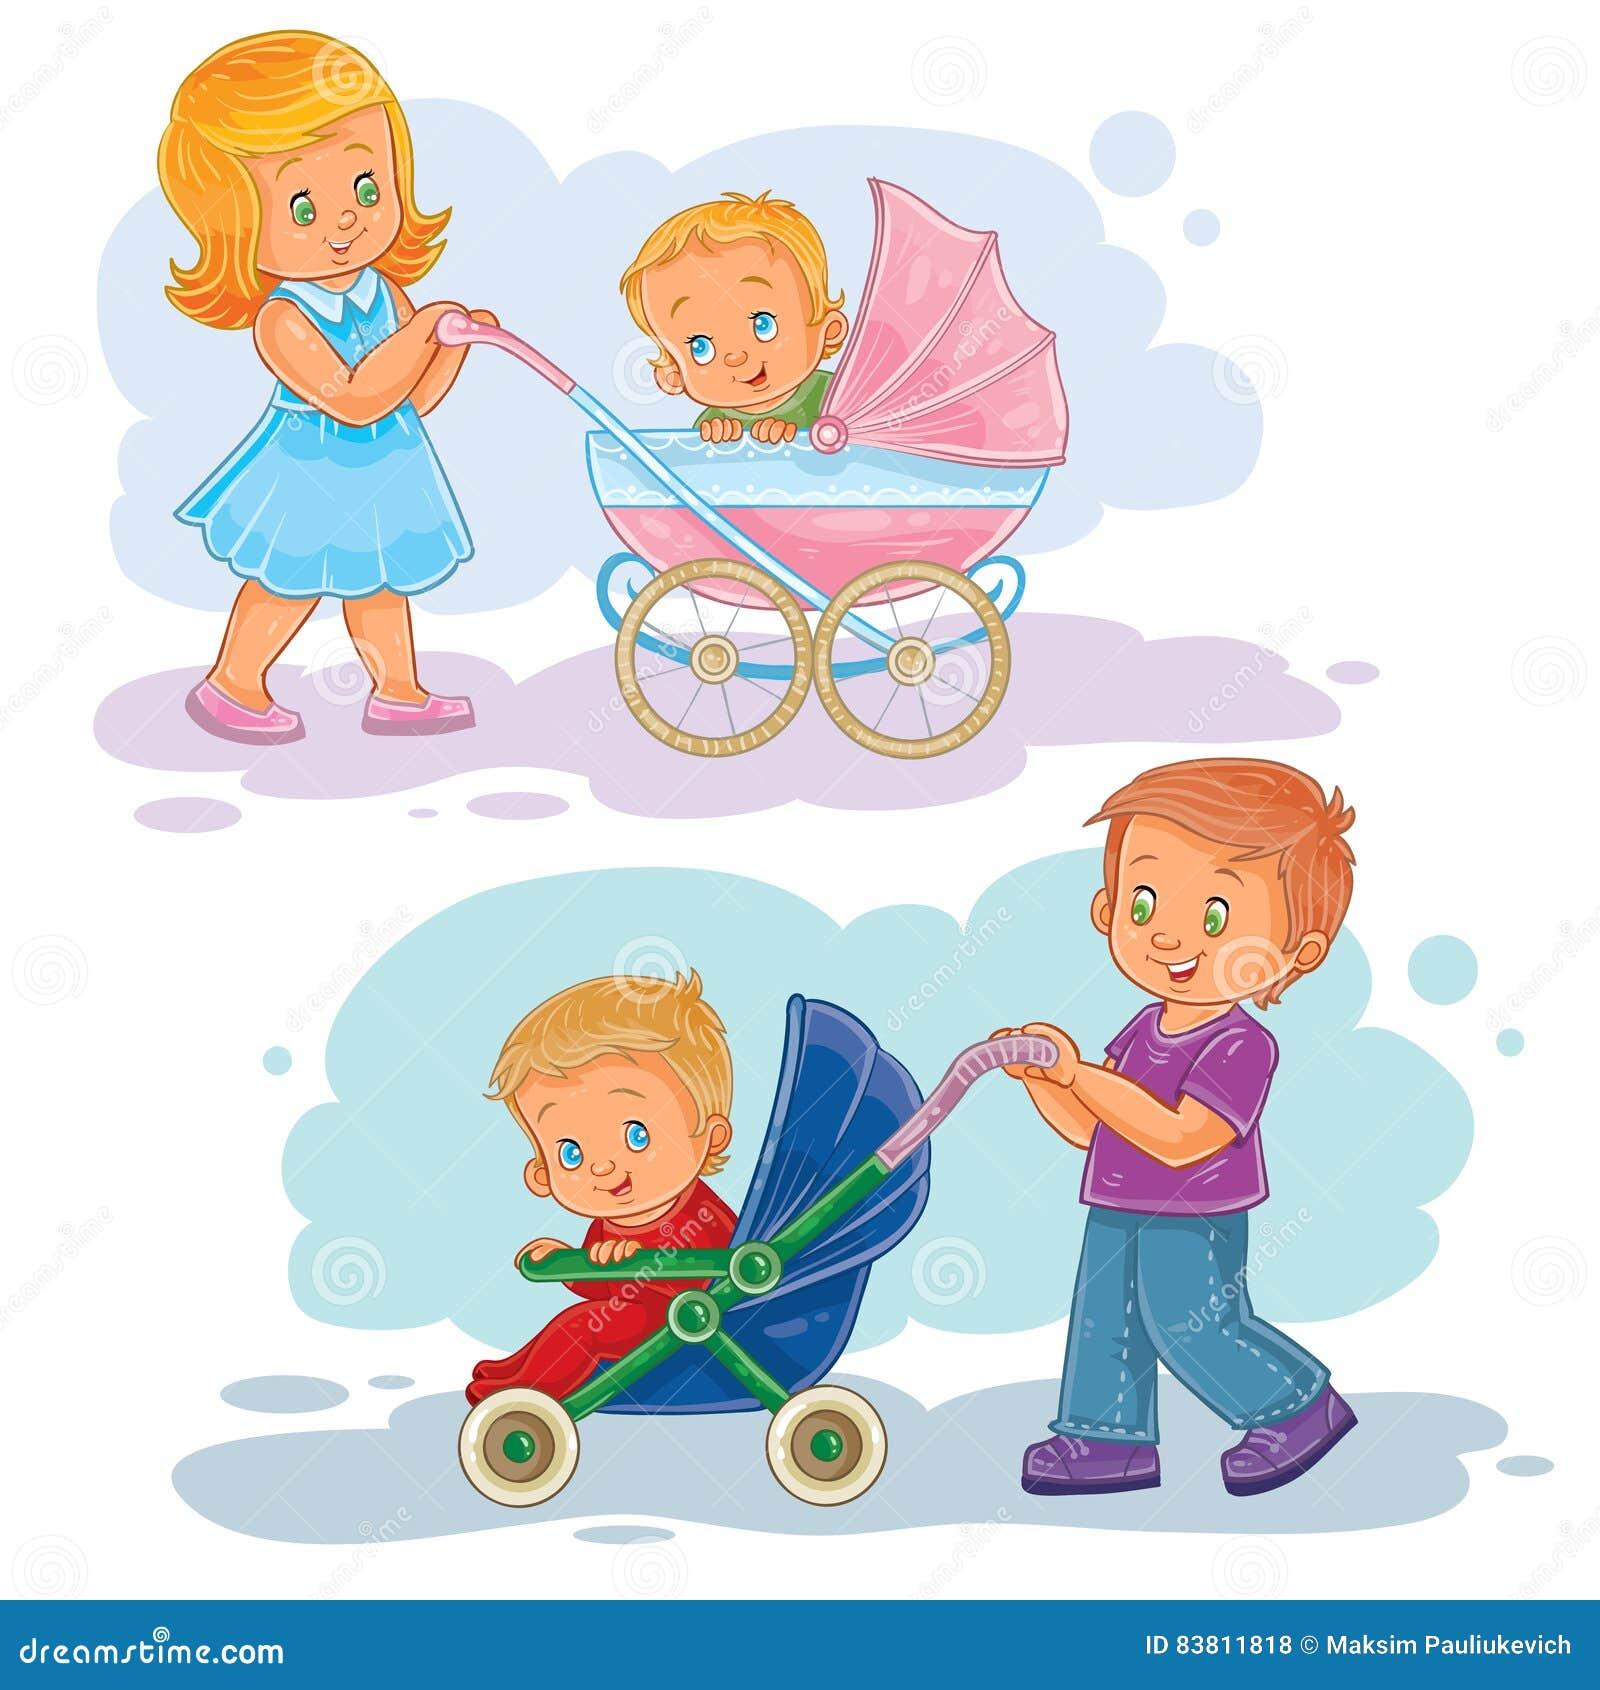 Stroller Cartoons, Illustrations & Vector Stock Images ... Baby Shower Elephant Cartoon